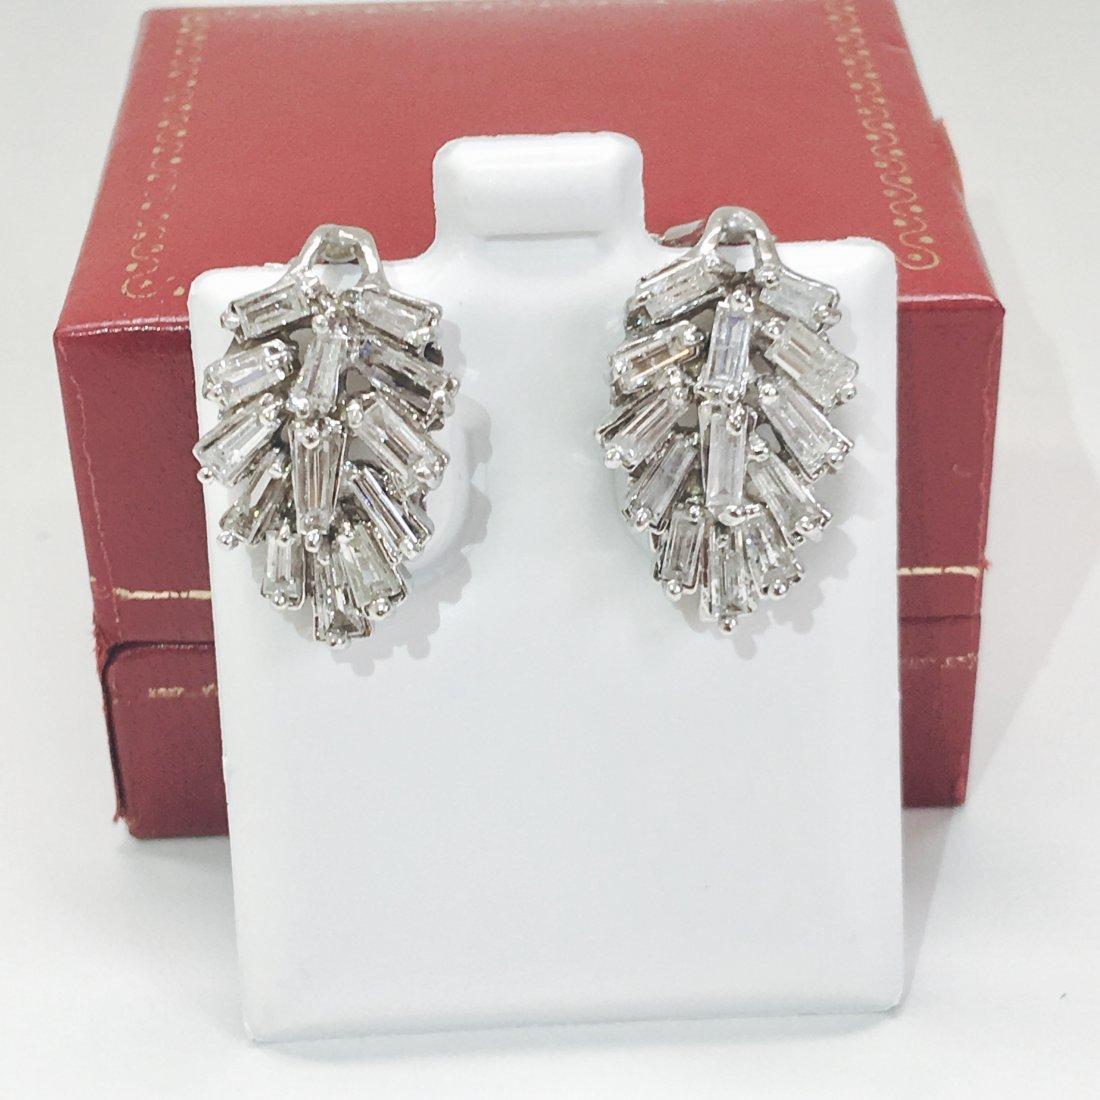 14K Gold, 4.20 Carat G color Diamond Earrings - 4